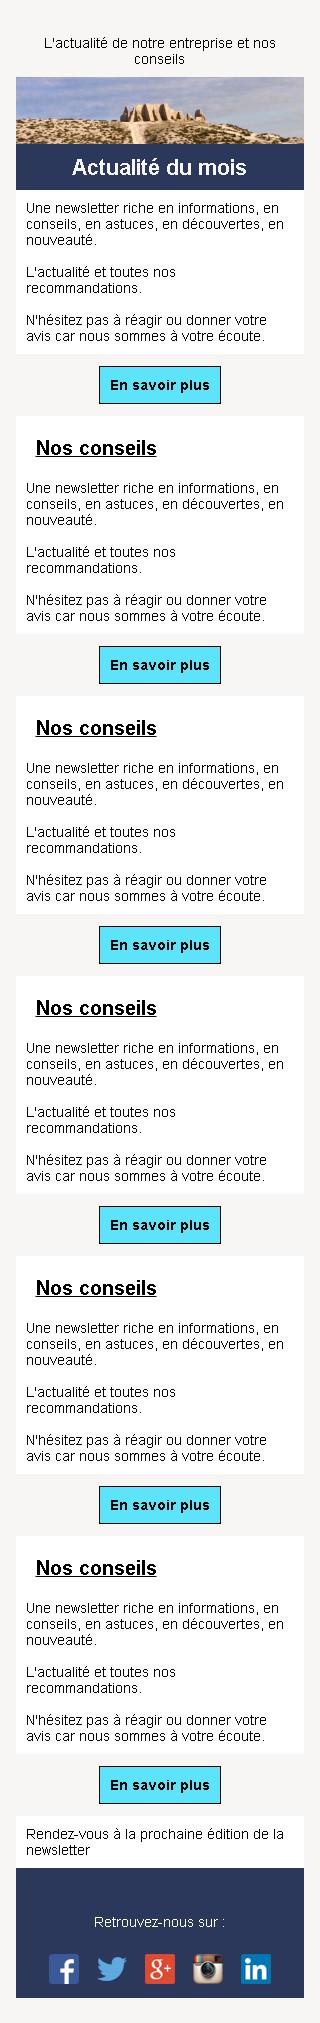 Newsletter sobre et bouton